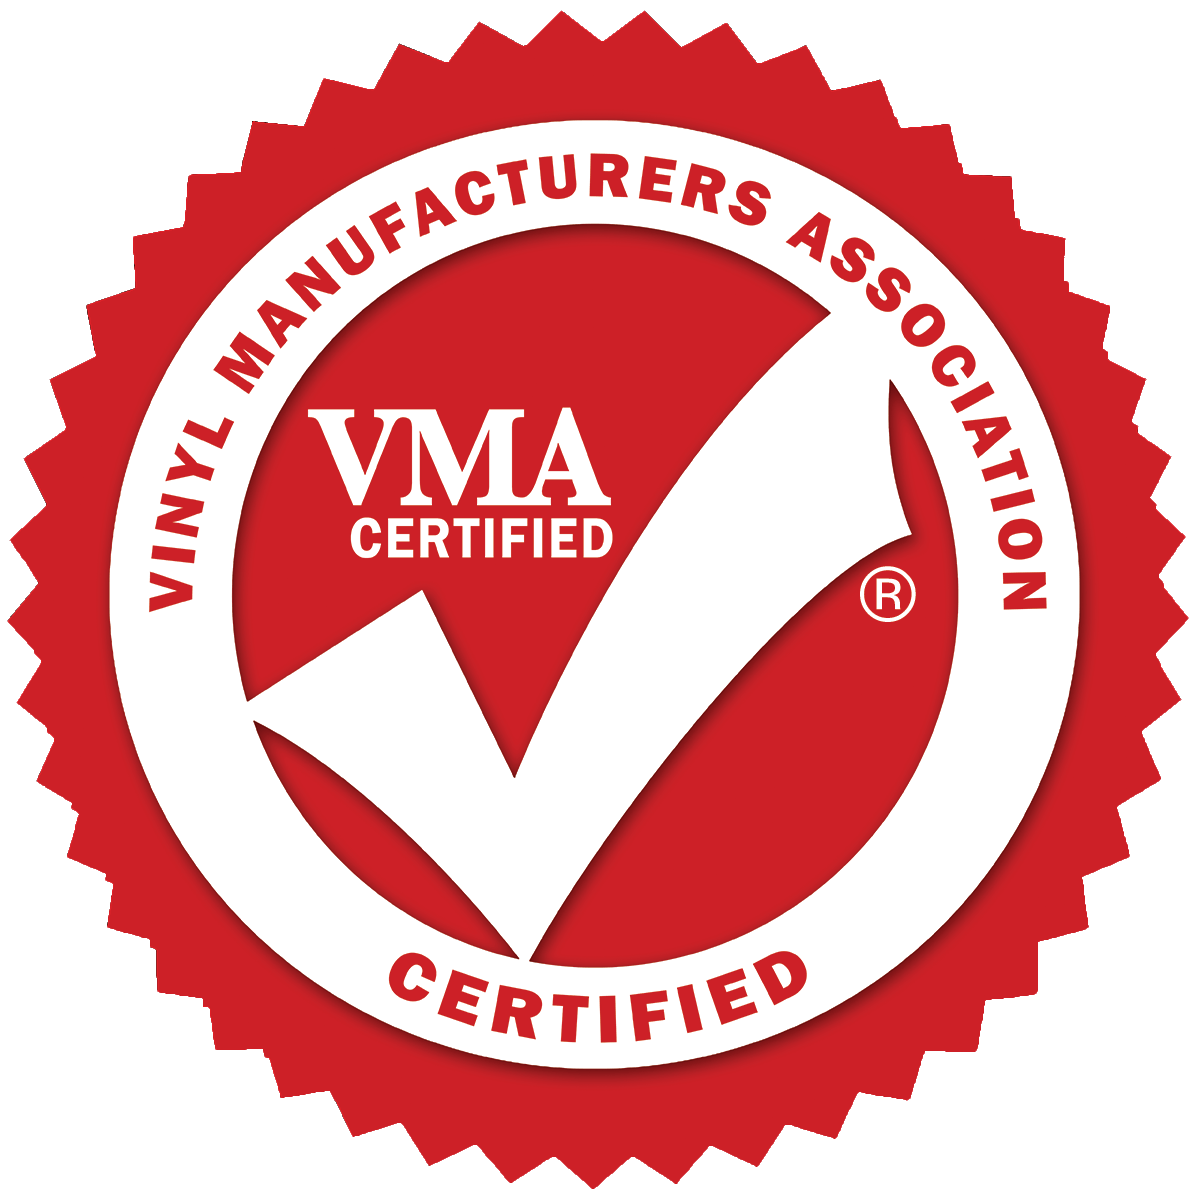 Vinyl Manufacturers Association certified logo